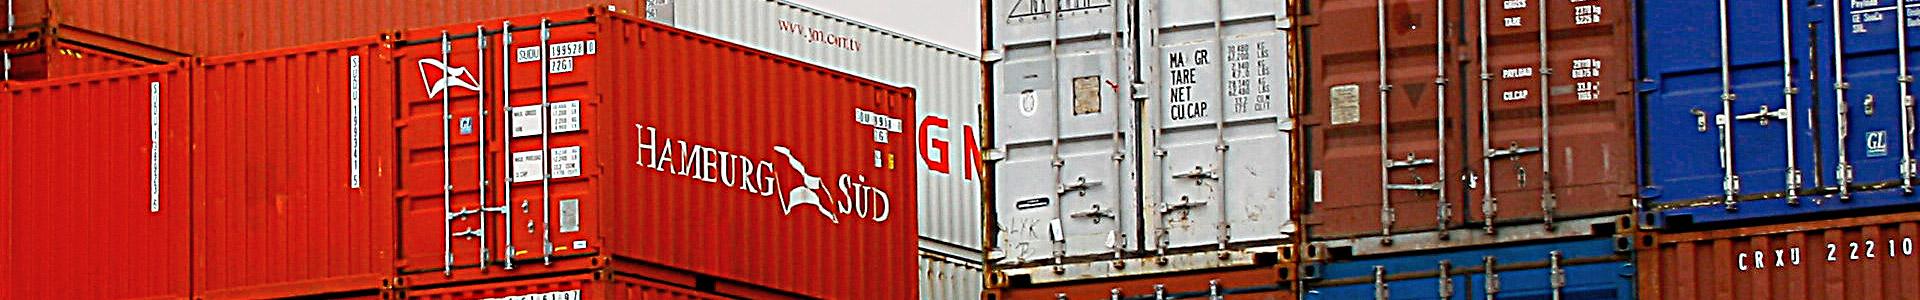 containerlagerung2